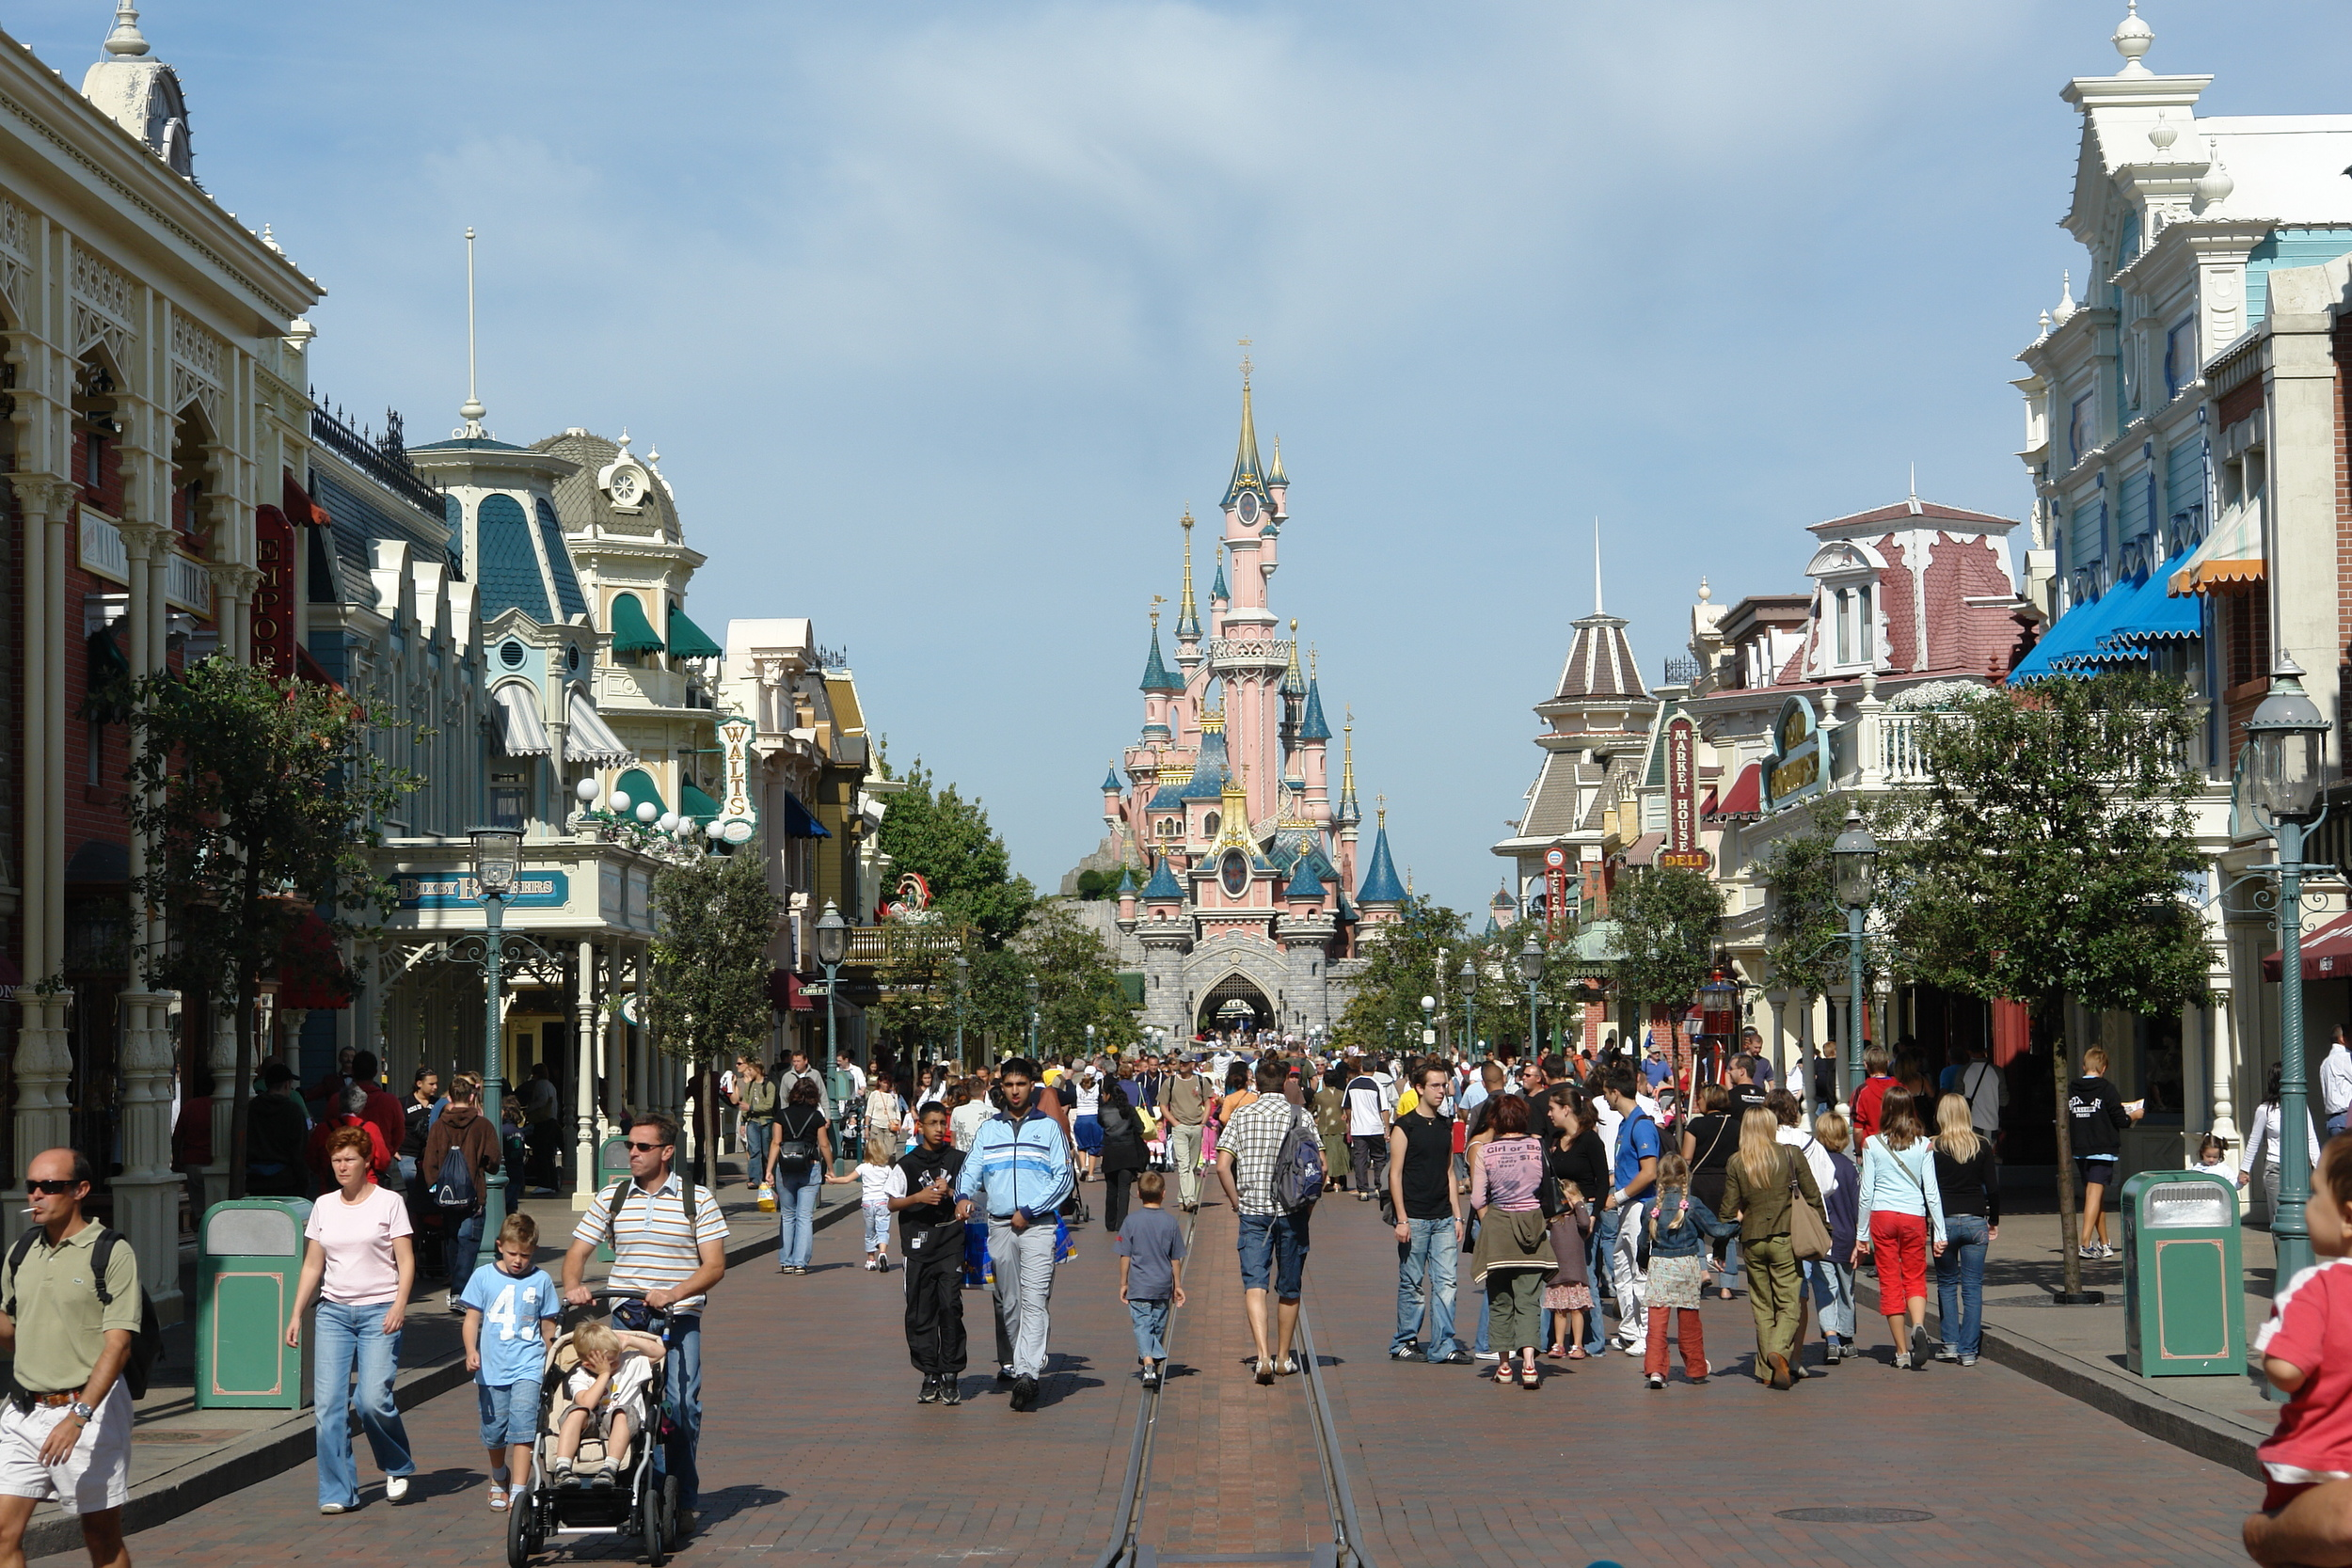 Main Street - Disneyland Paris  Paris, France